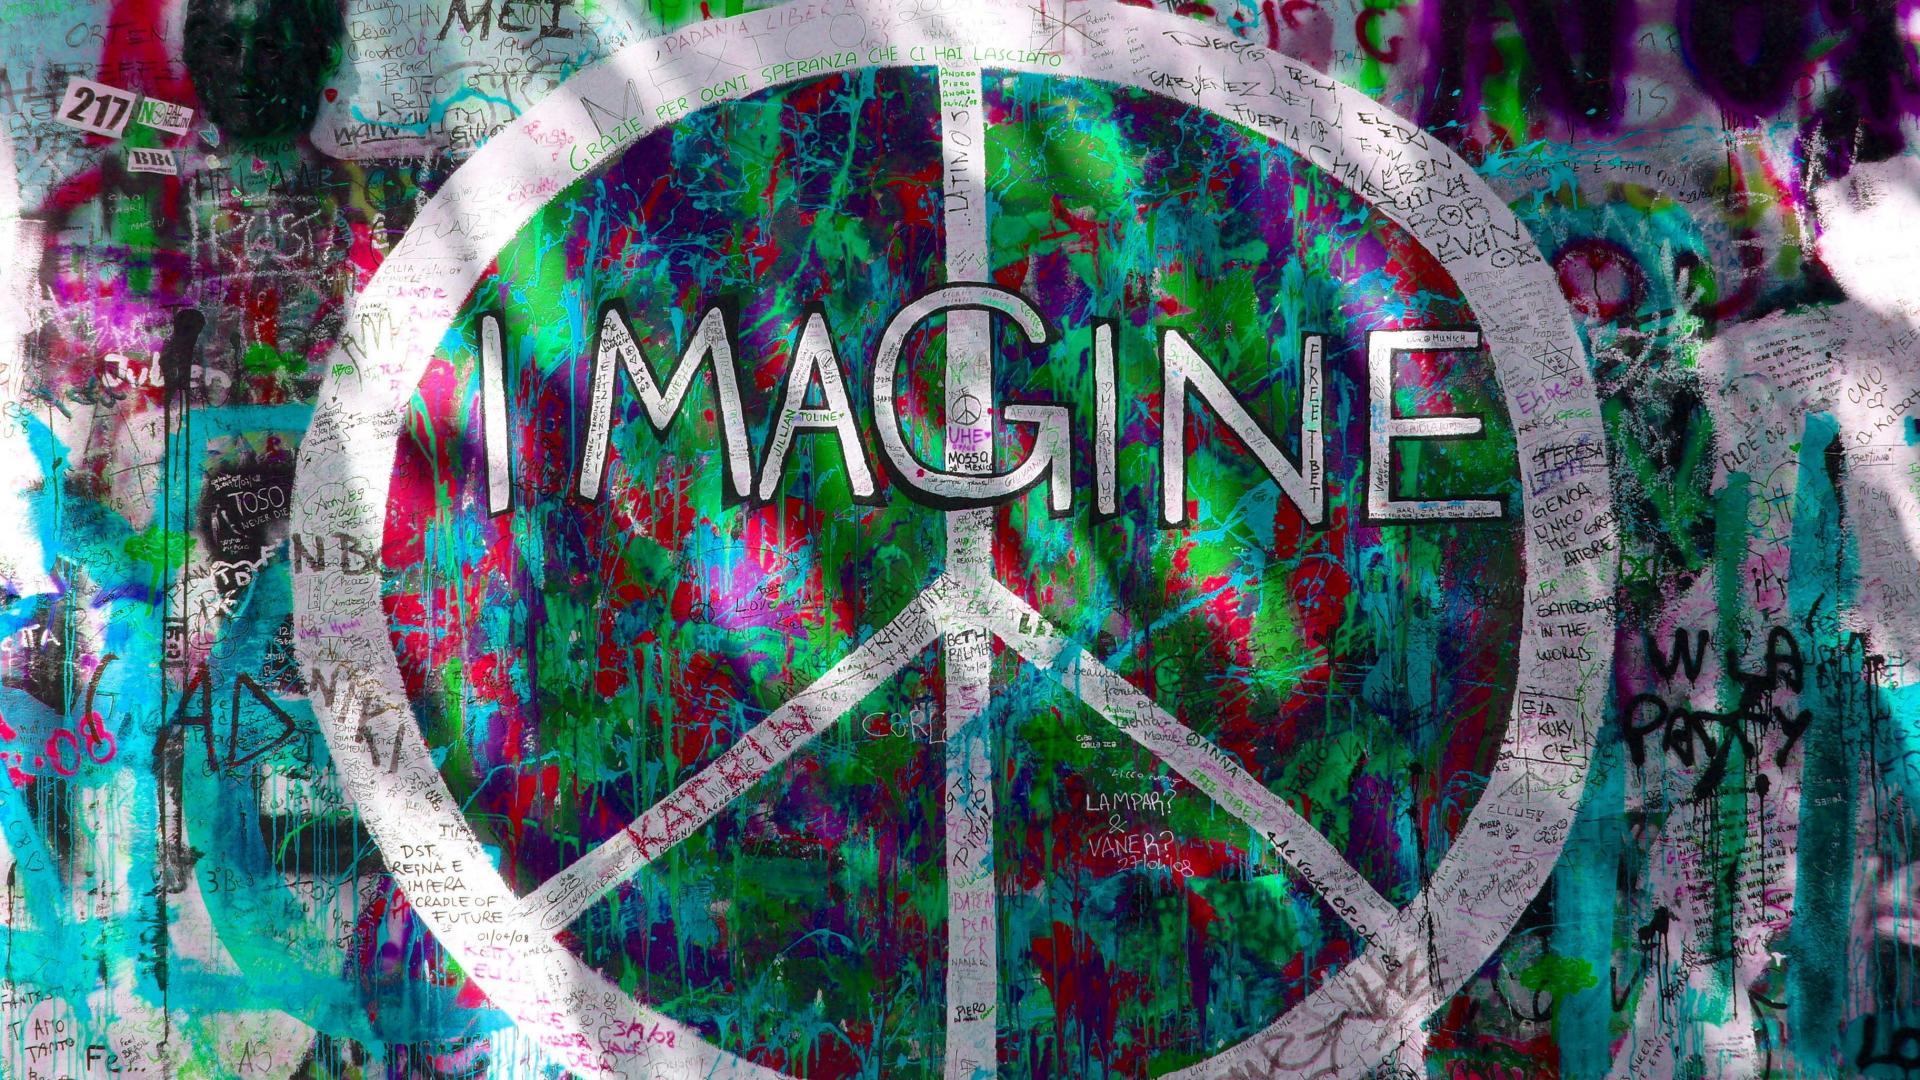 Graffiti imagine peace sign wallpaper 67810 1920x1080